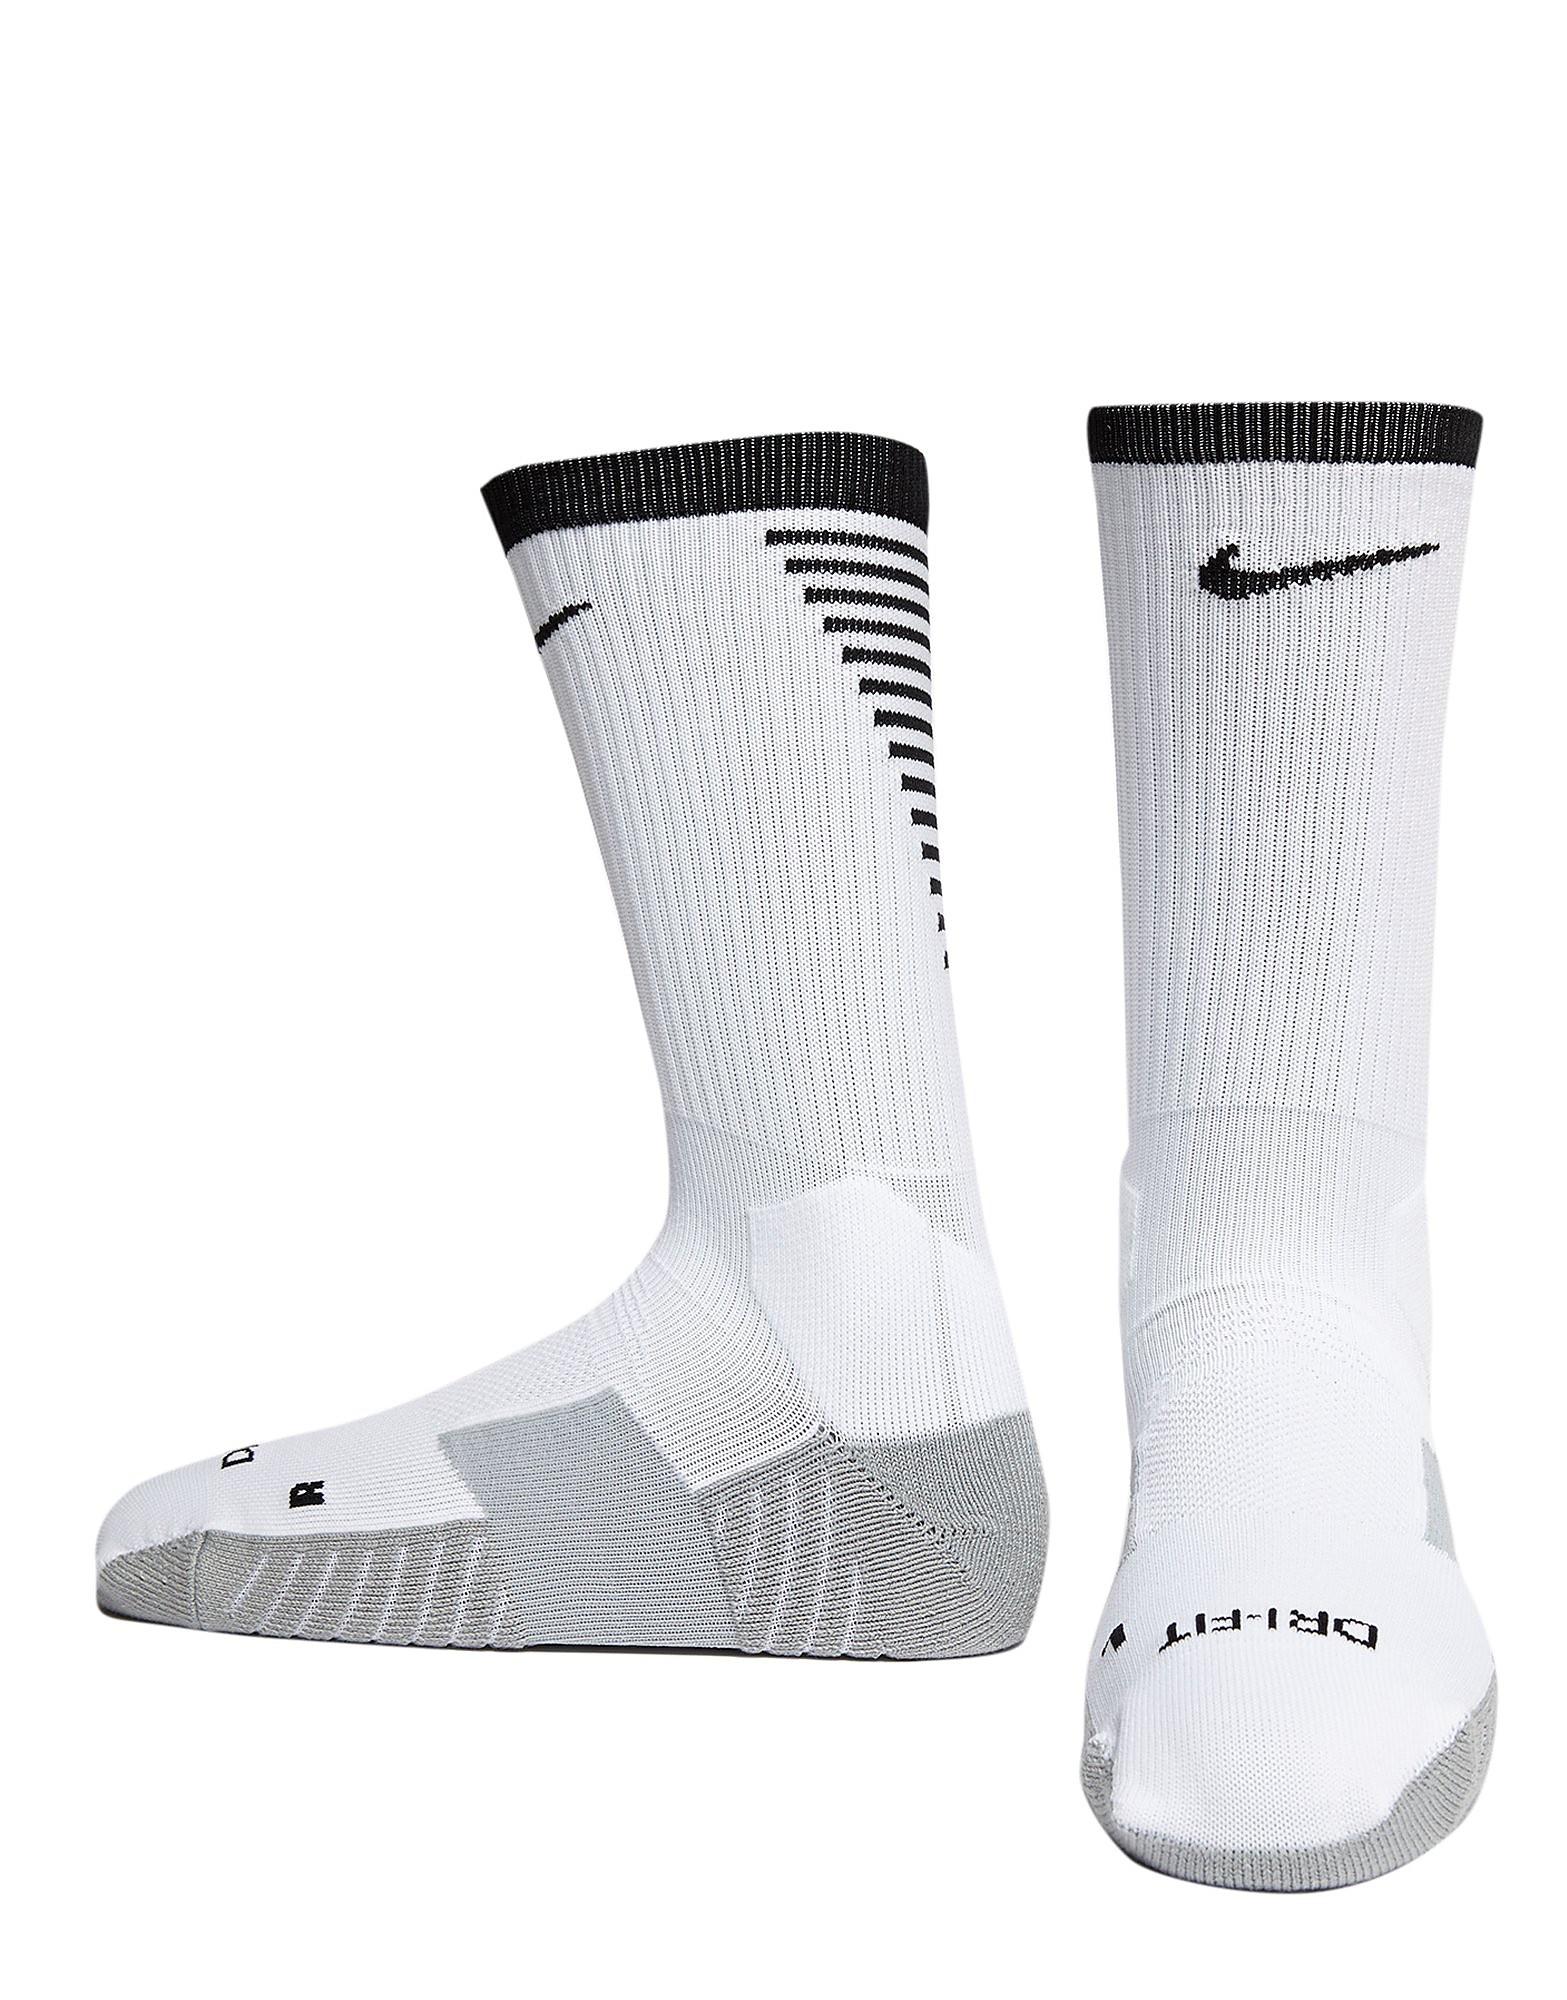 Nike MatchFit Crew Football Socks